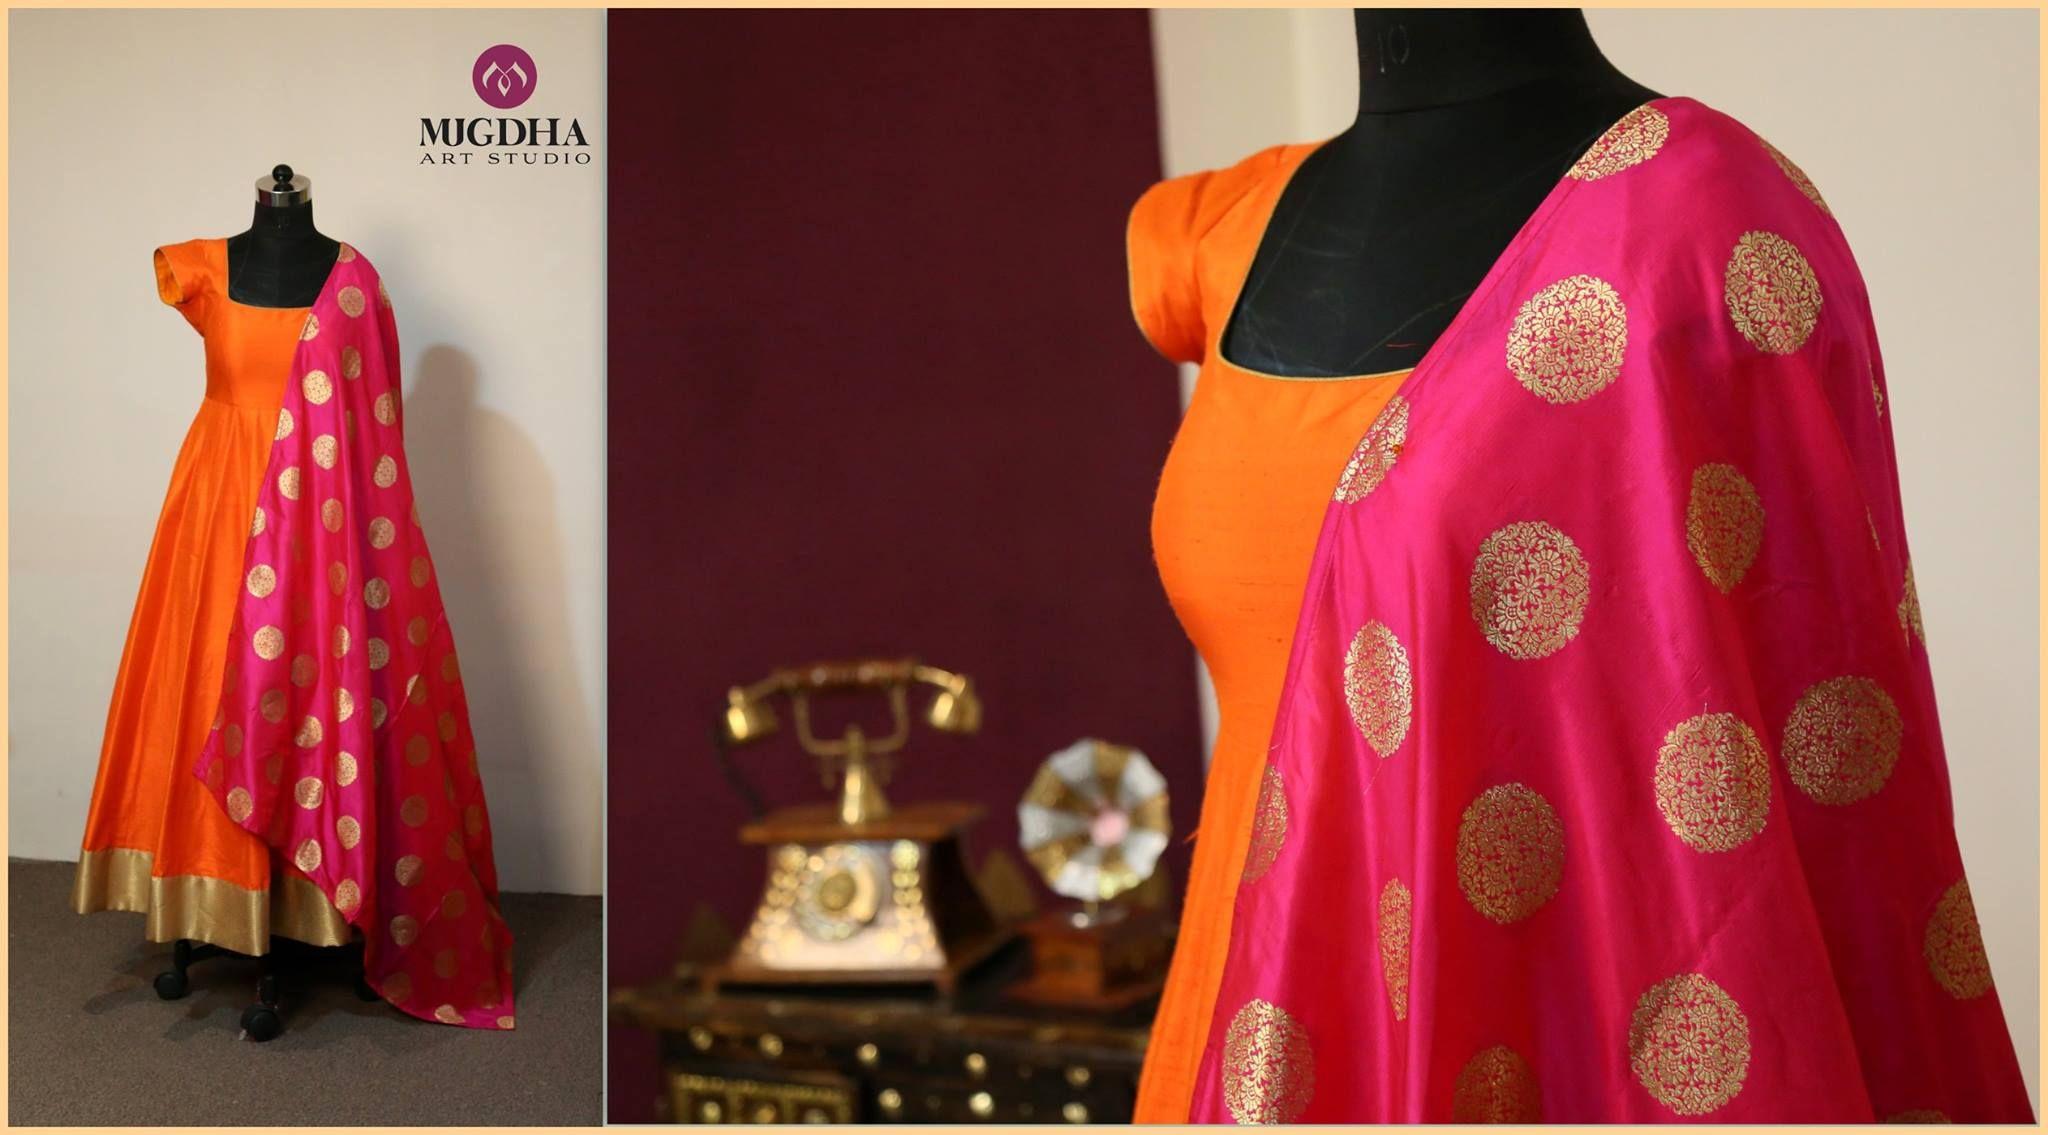 Classy outfit from Mugdha art studio...!!Orange anarkali with pink banaras dhupatta...Grab it soon...!!Code : MA - 83 For orders /enquiries-Wats app - 9010906544Contact - 9949047889/040 65550855Email- mugdha410@gmail.com 08 September 2016